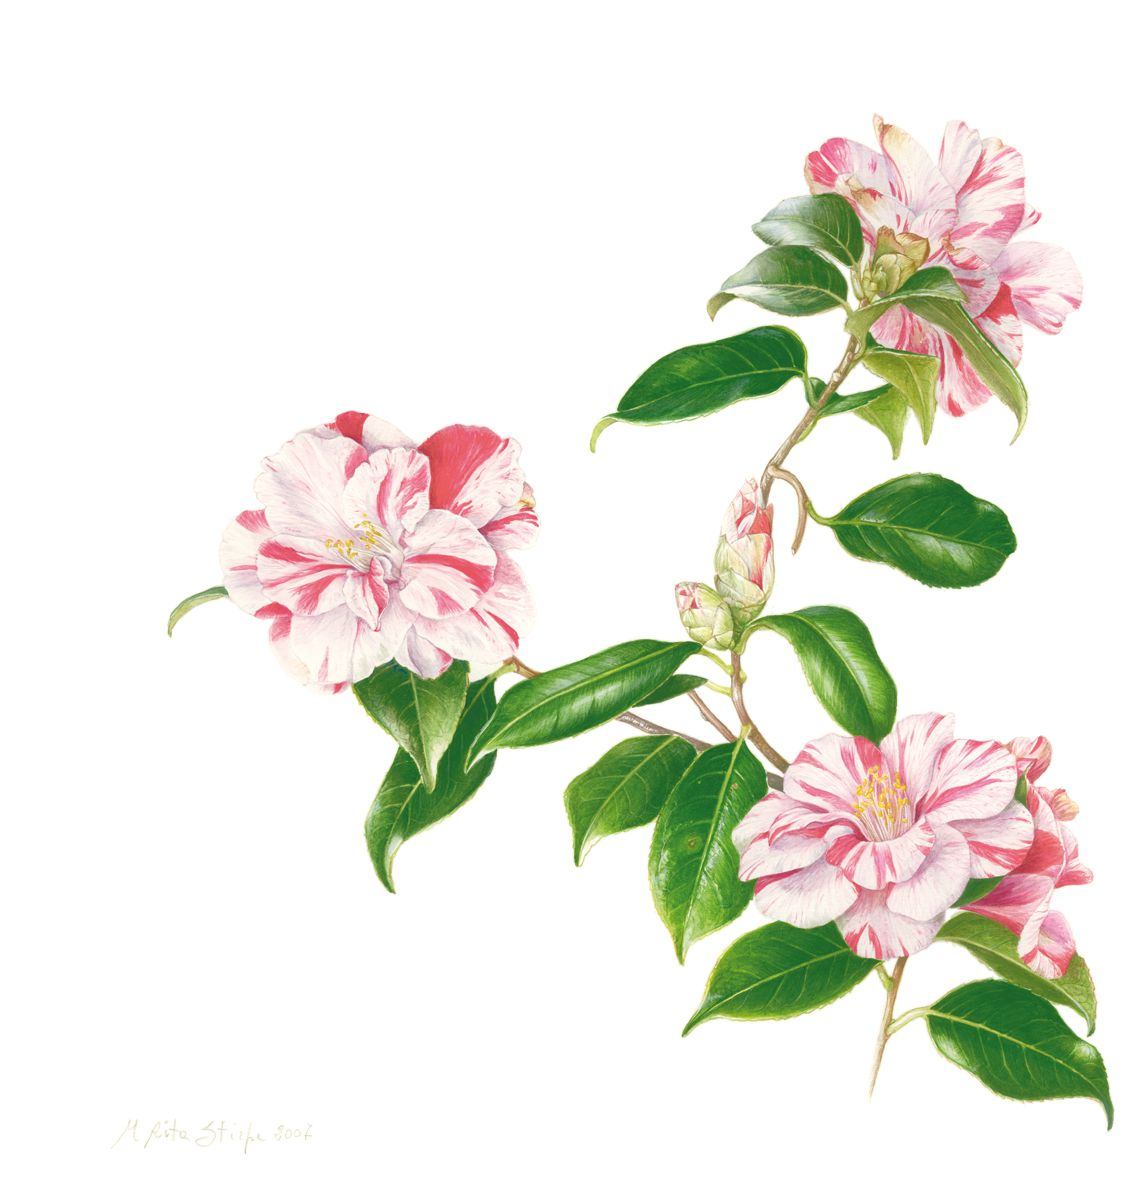 Pittura Botanica - Maria Rita Stirpe